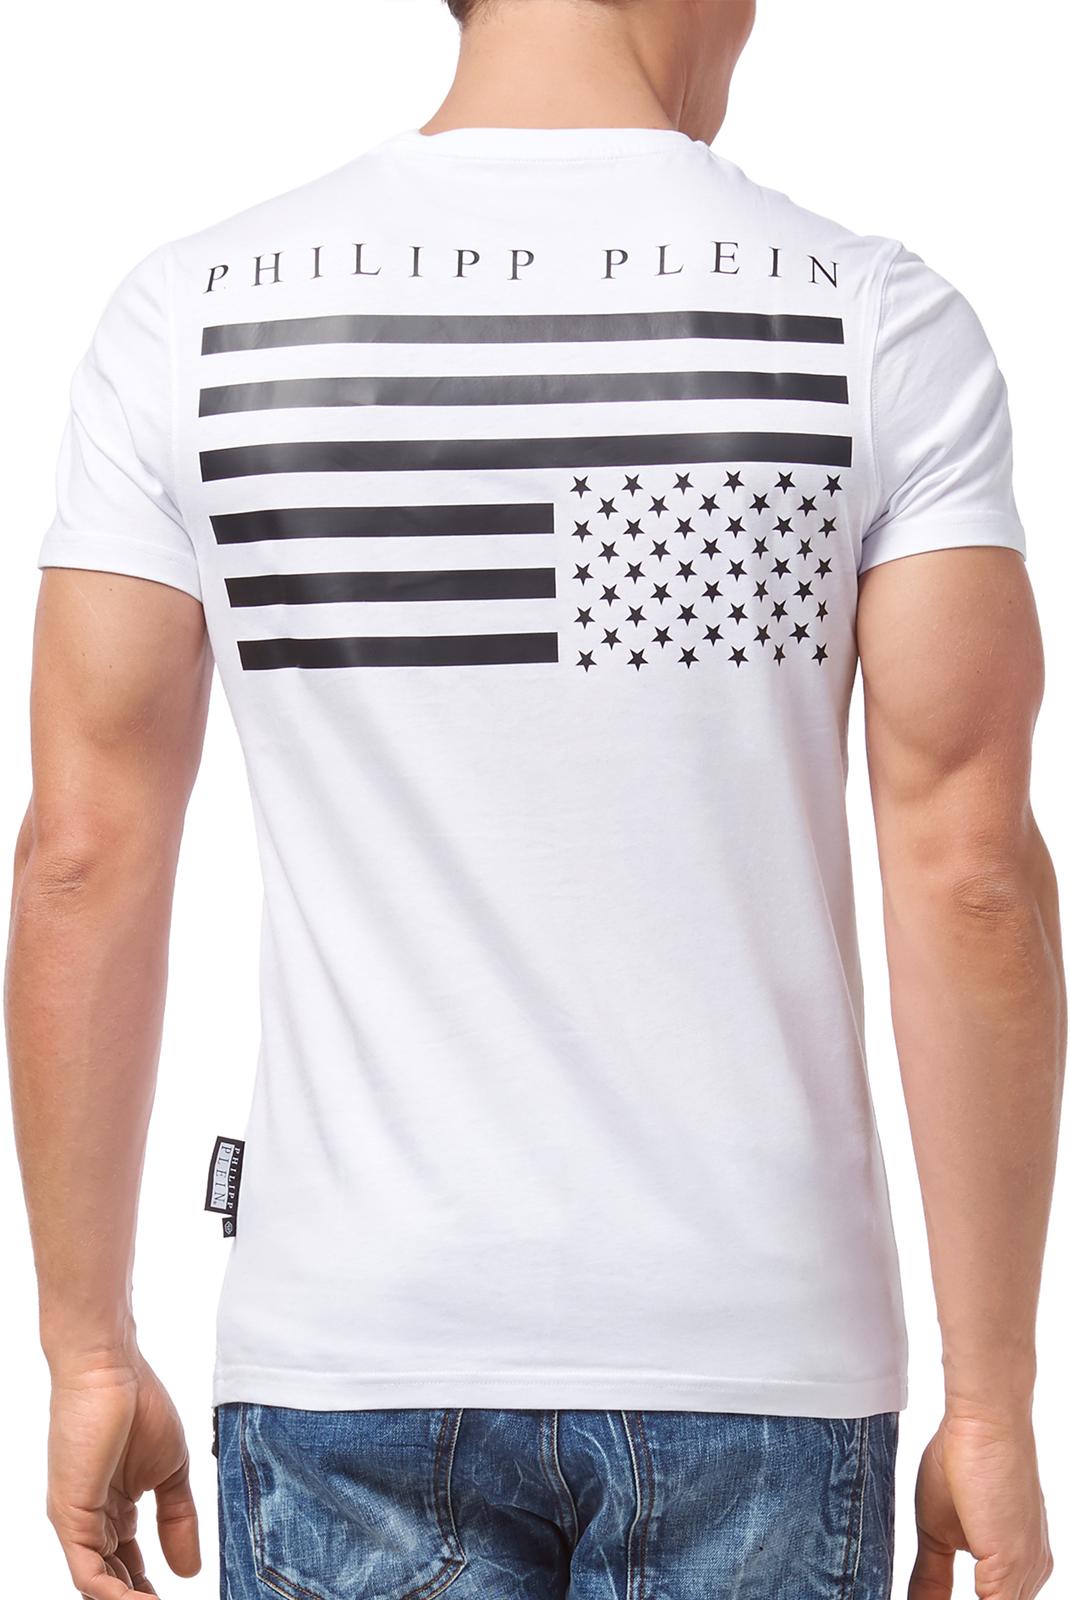 Tee-shirts  Philipp plein A17C MTK1403 LOVE 01 WHITE